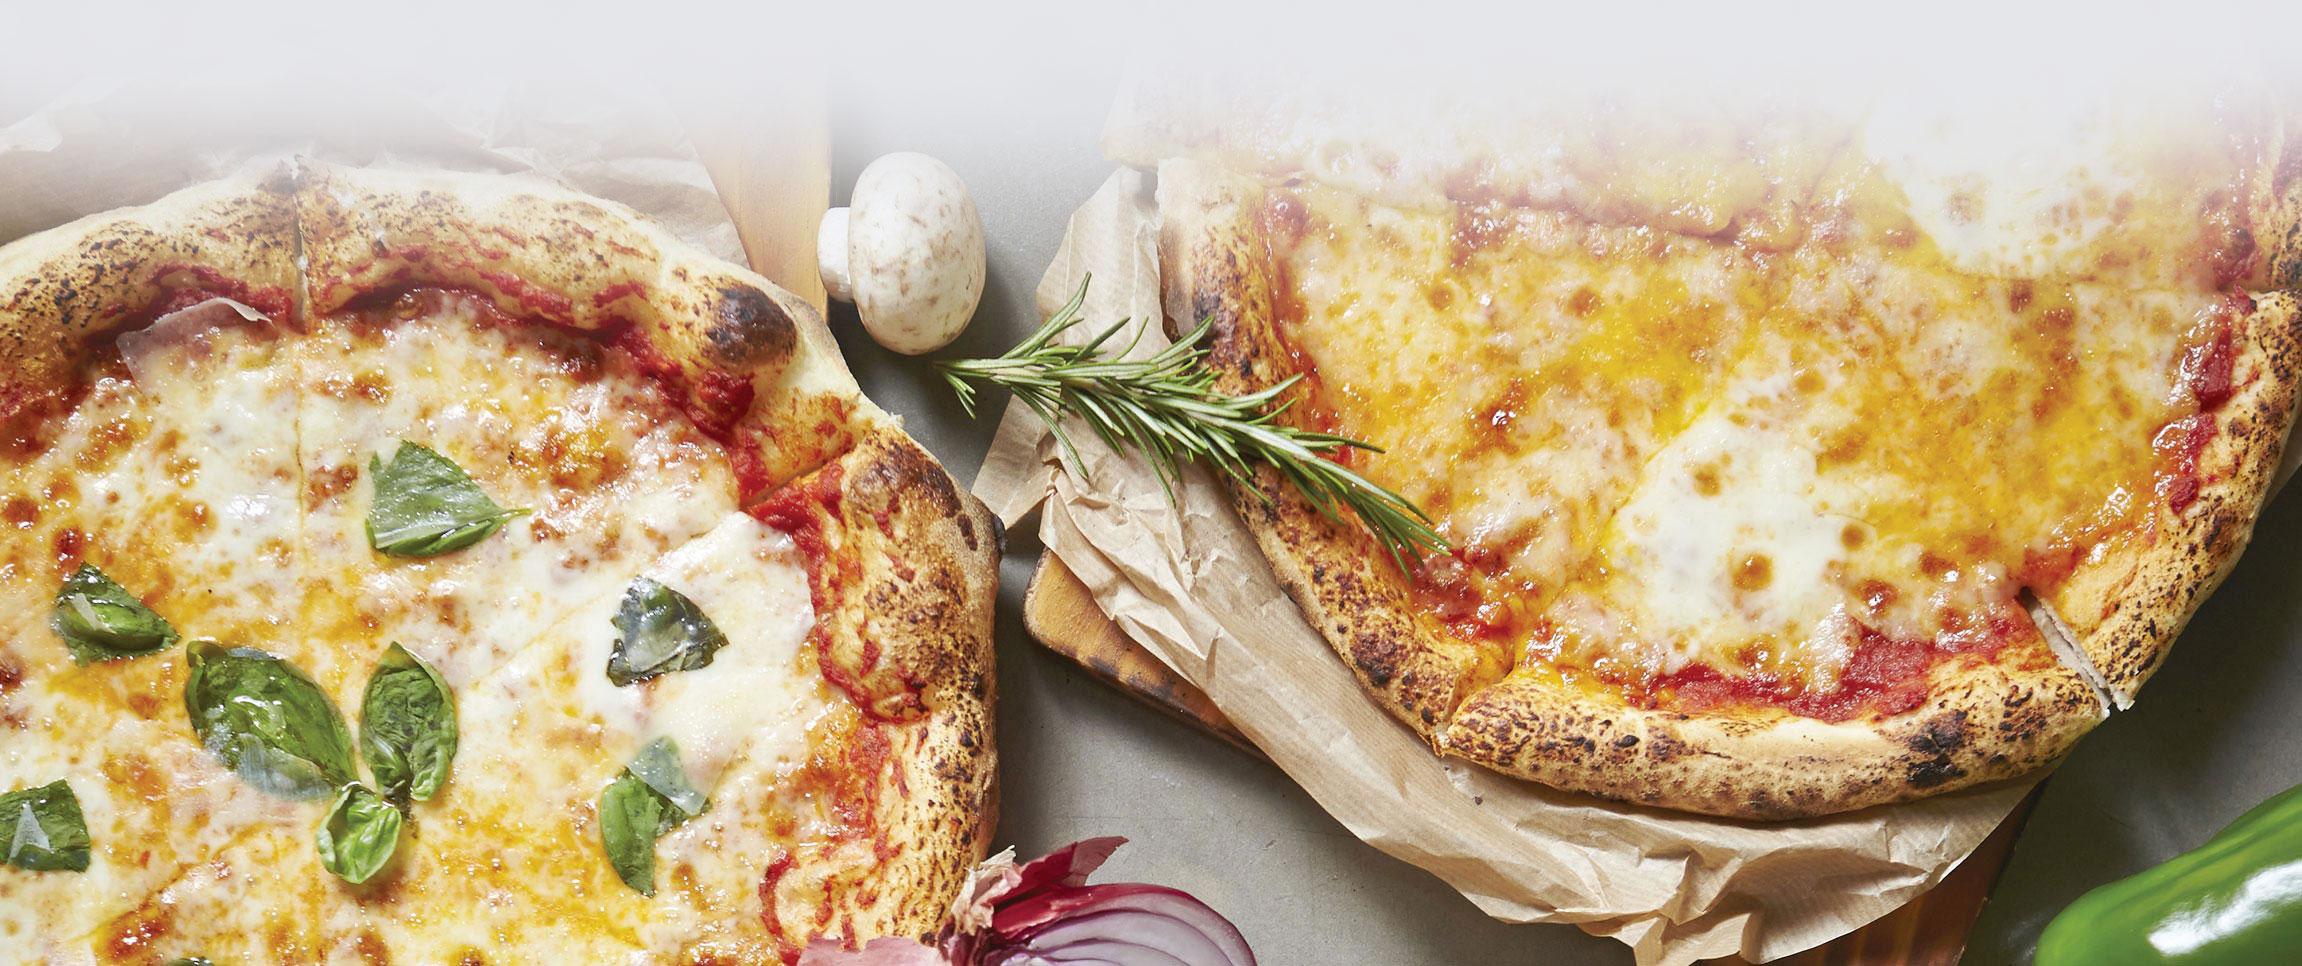 roma performance foodservice